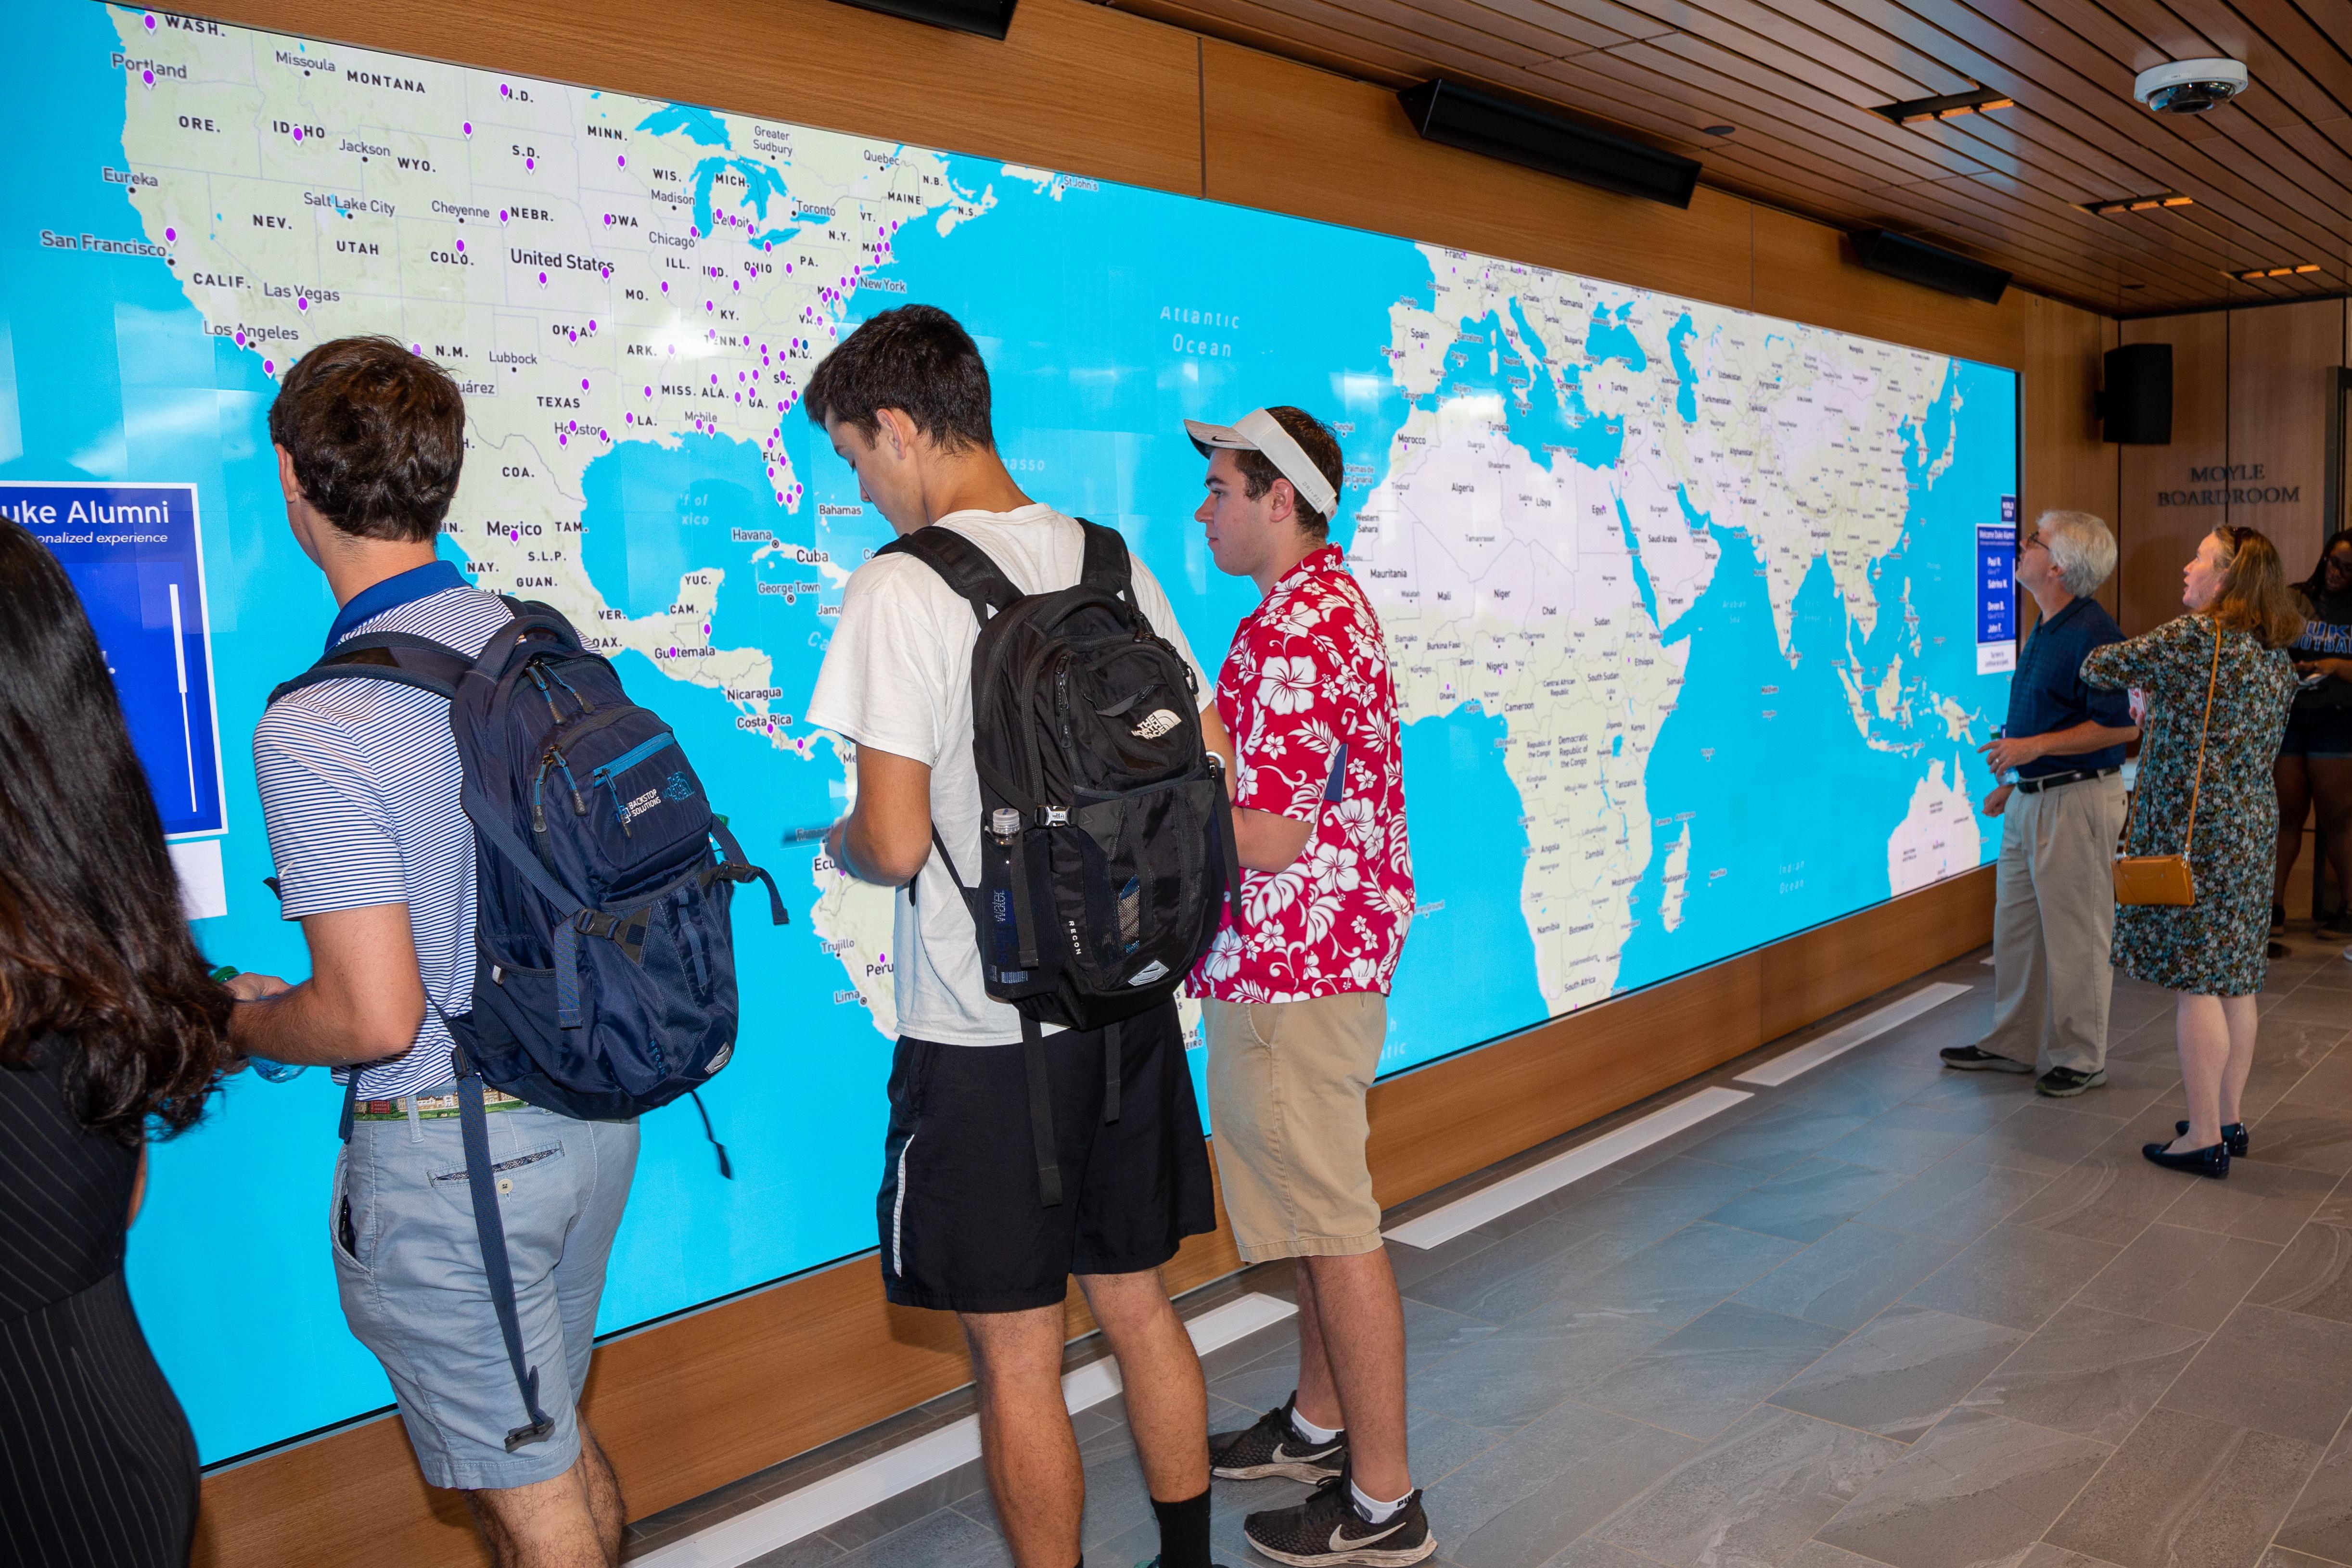 T1V-Duke-Karsh-Alumni-Visitors-Center-Interactive-Wall-Collaboration-Software-Active-Learning